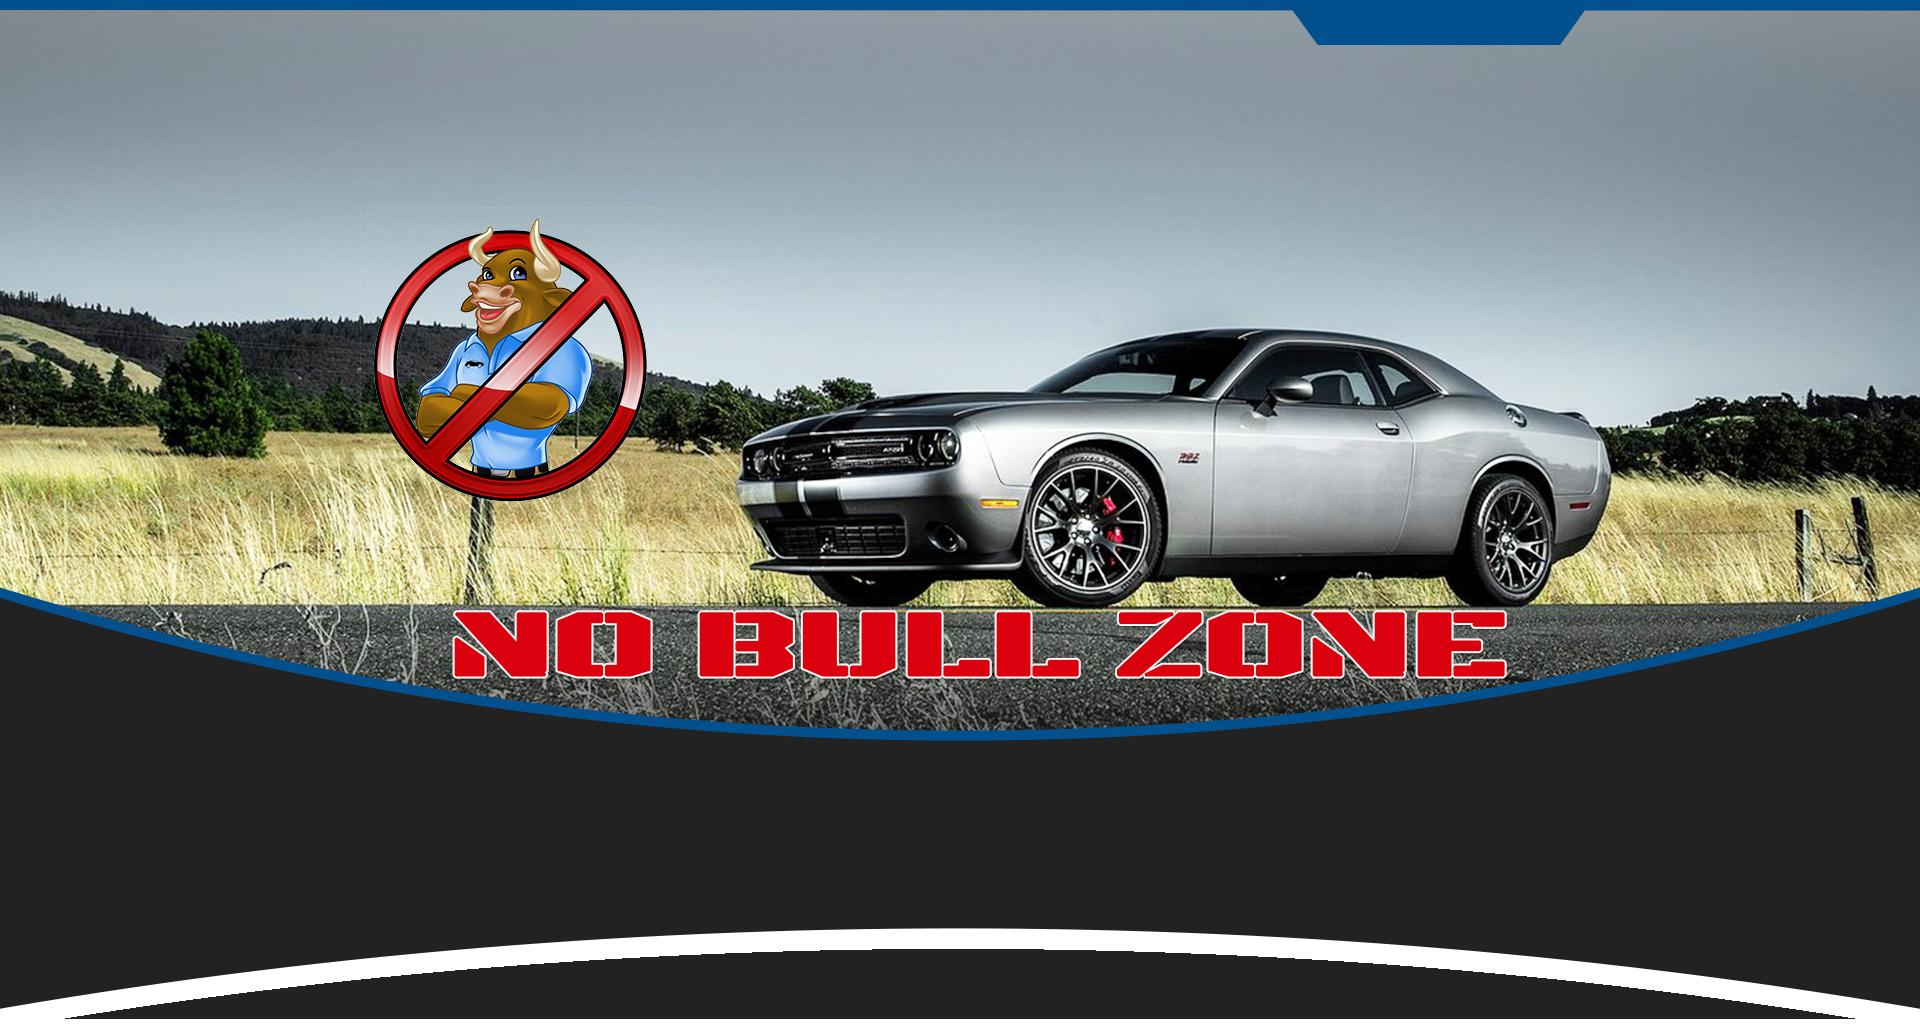 Car Lots In Lenoir Nc >> Car Guys Used Cars Lenoir Nc Dealer